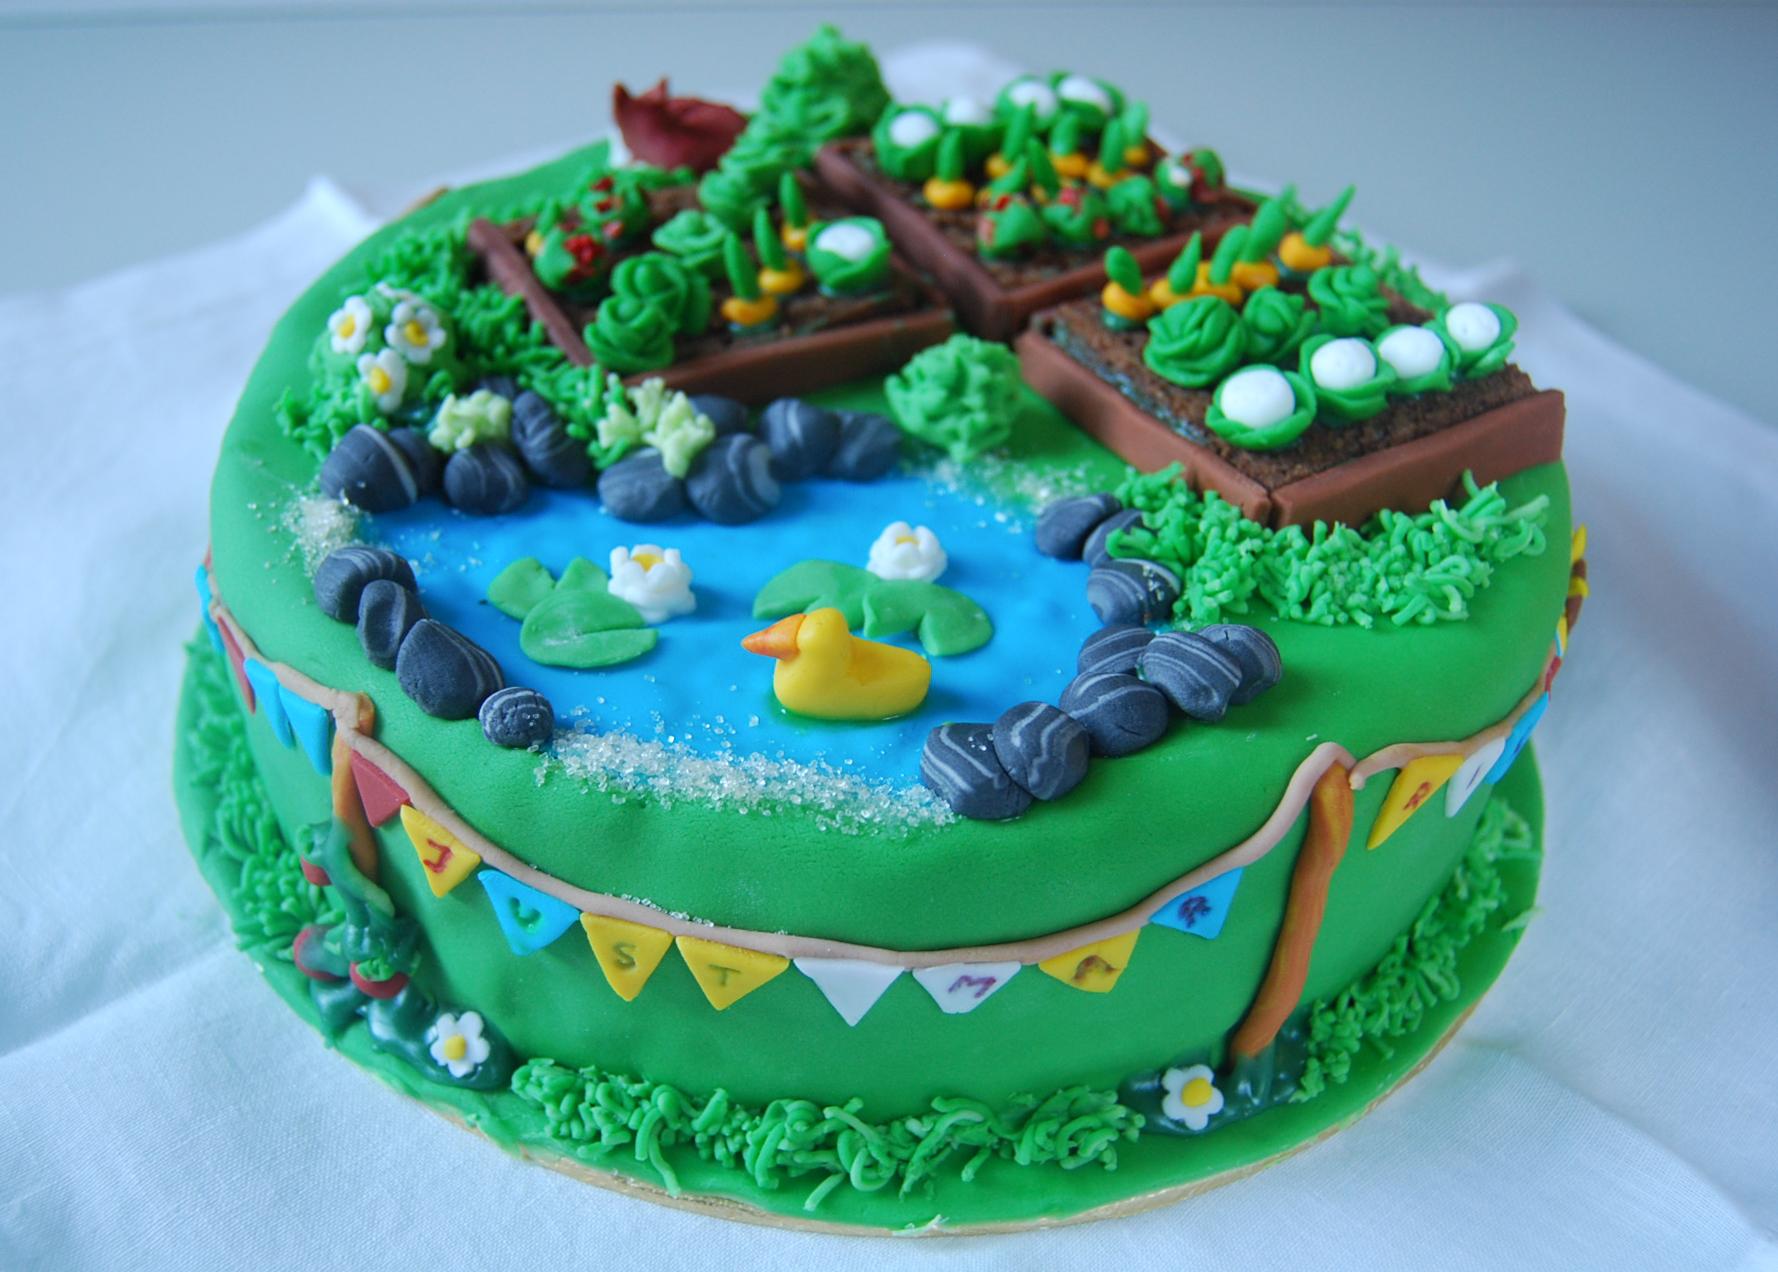 Allotment Cake Recipe